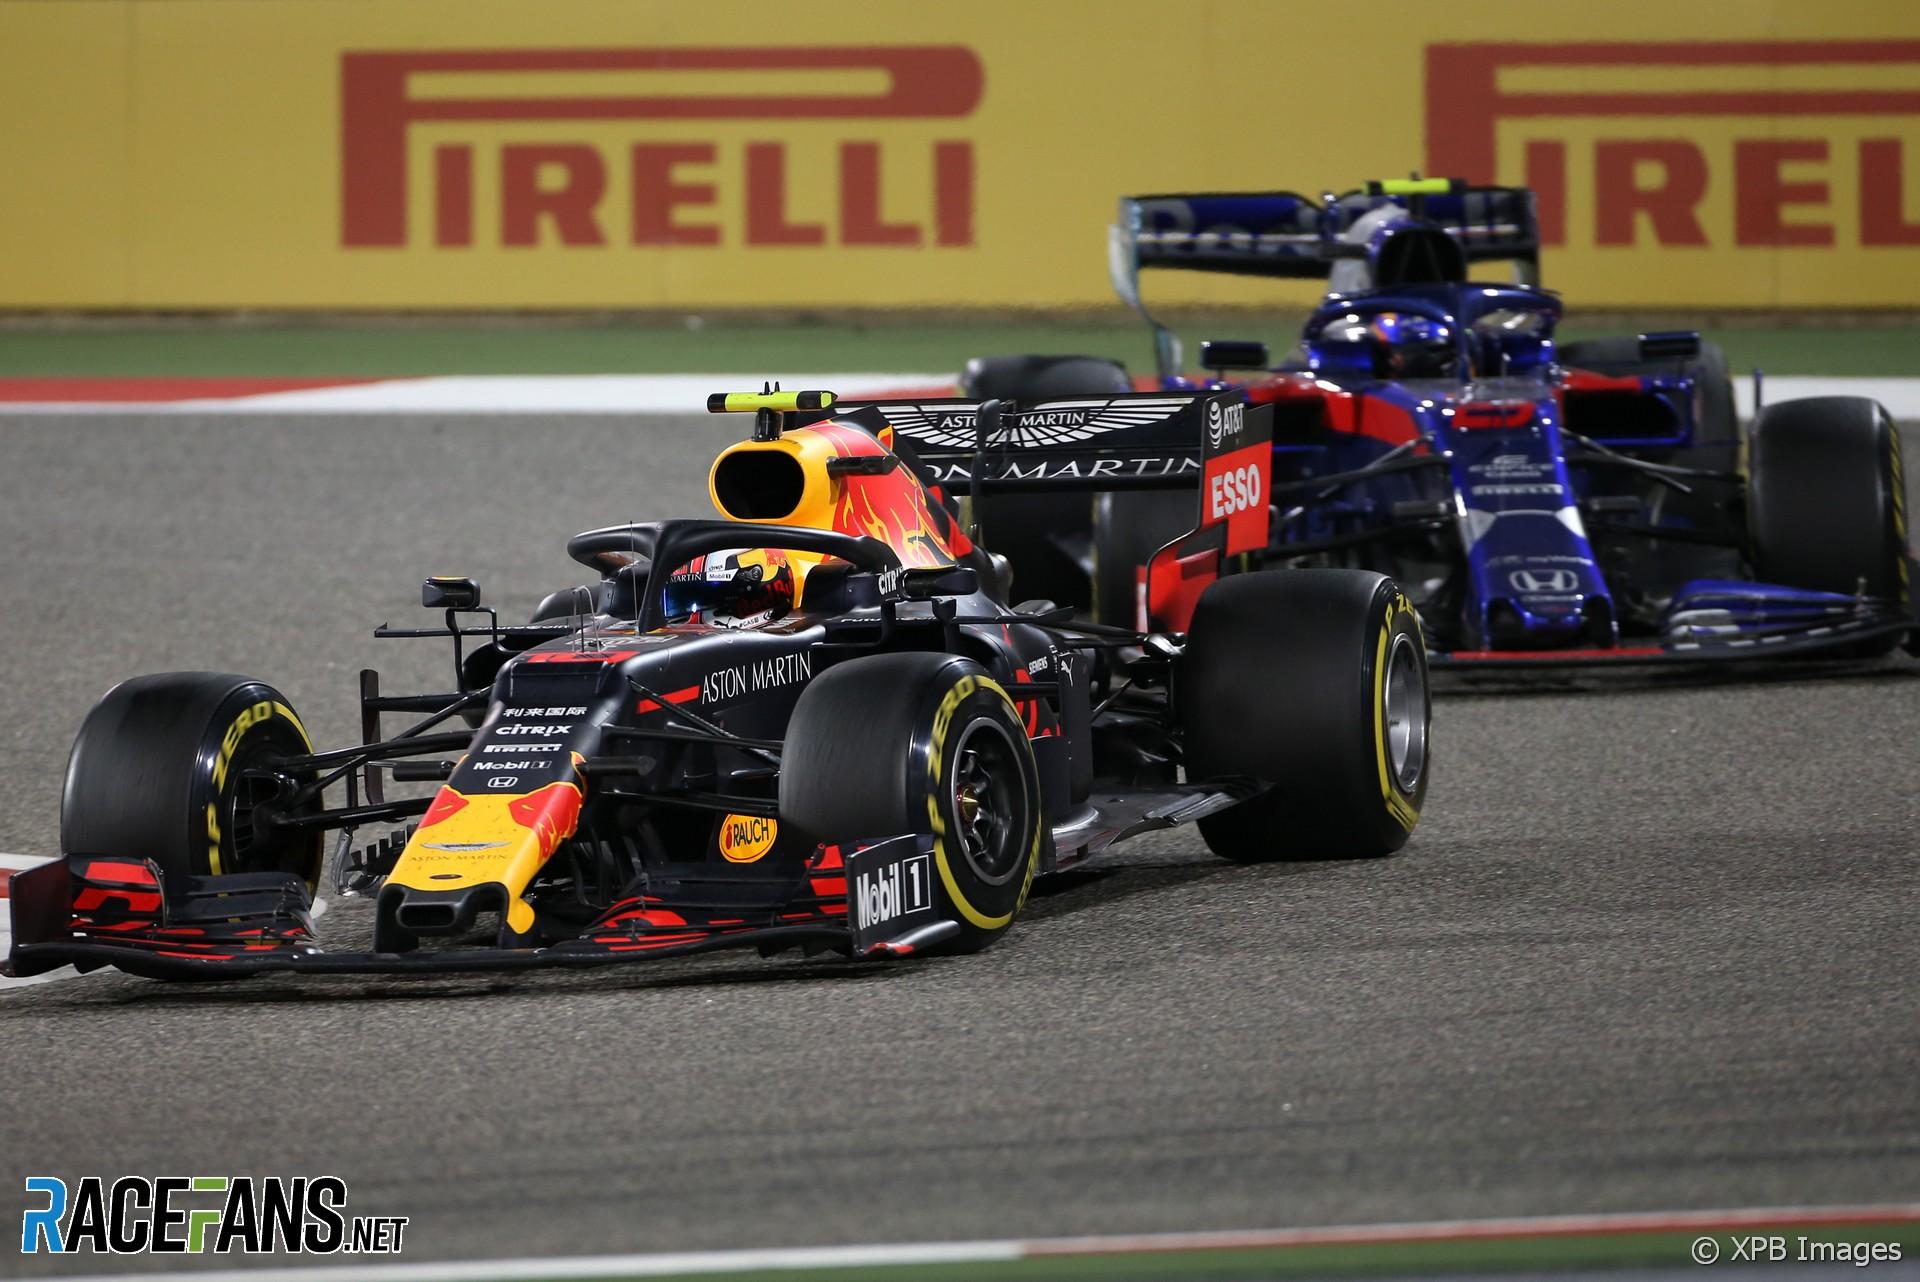 Pierre Gasly, Red Bull, Bahrain International Circuit, 2019